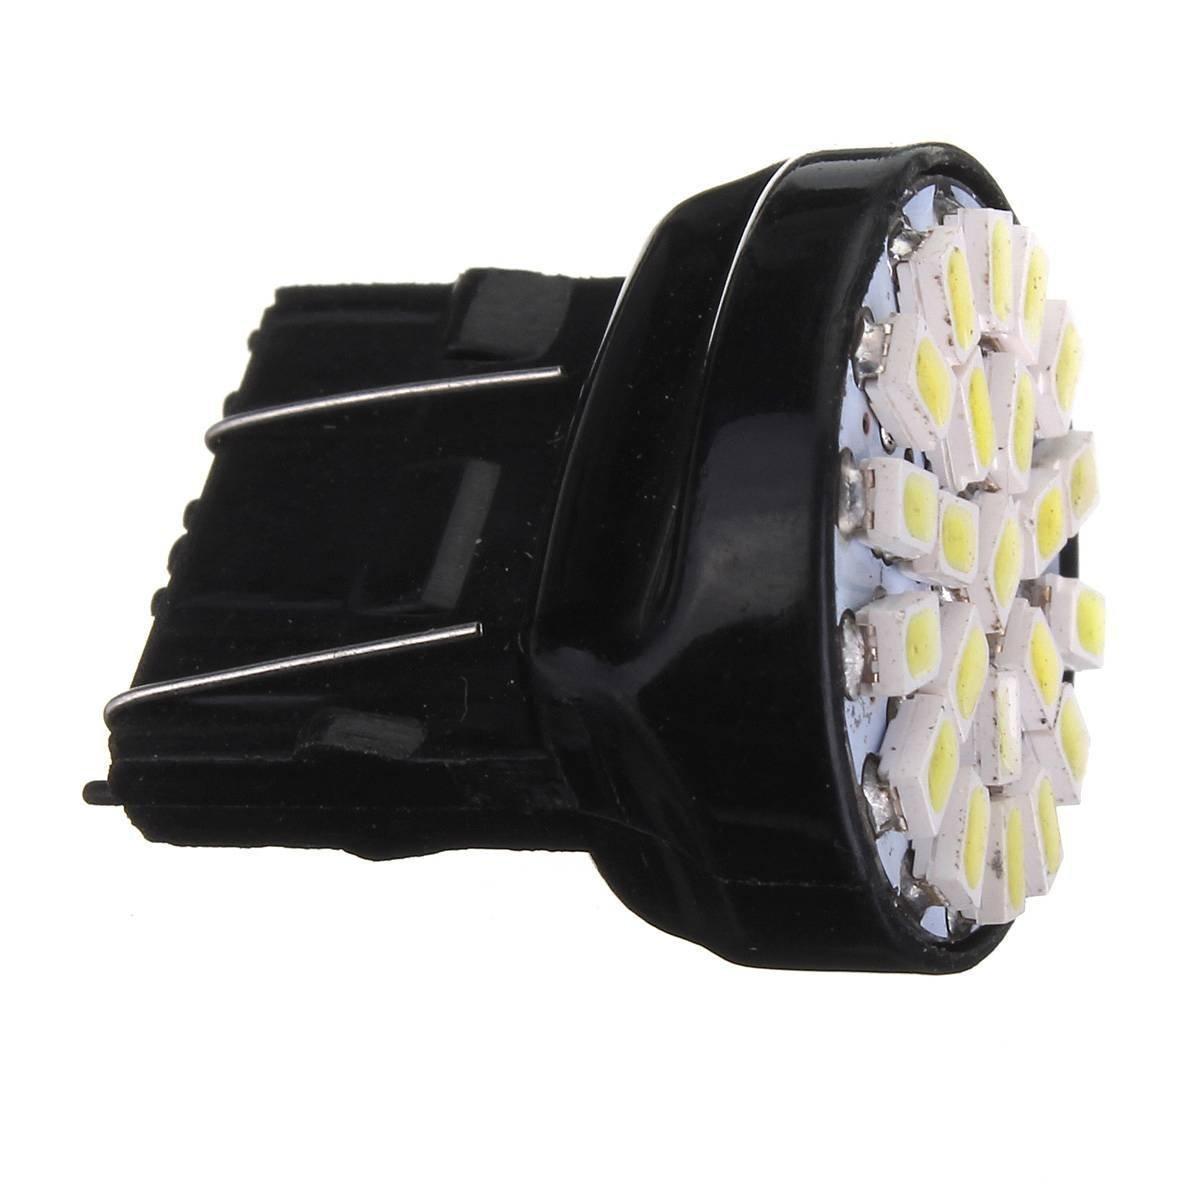 SODIAL(R)2x 2W T25 3157 22 LED Brake Lights Position Indicator Stop P27 / 5W Car Bulb Auto Lamp 100-150LM DC 12V White 6000-6500K 072639